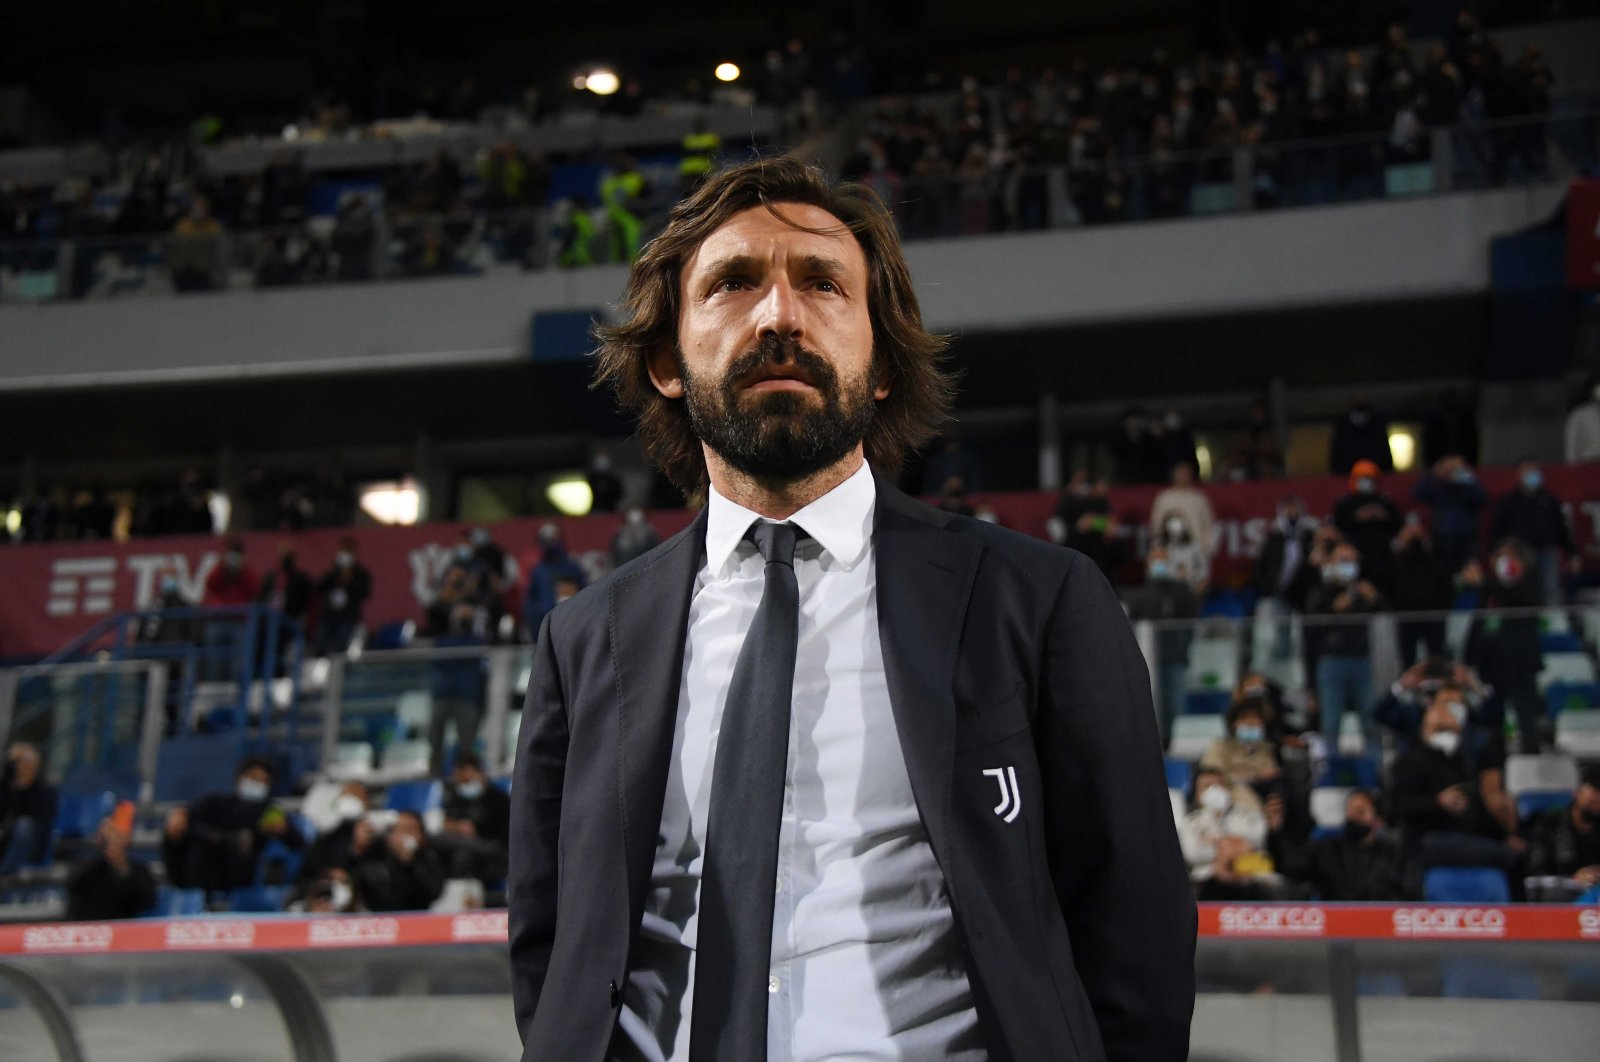 Juventus coach Andrea Pirlo watches the Coppa Italia final against Atalanta at the Mapei Stadium in Reggio Emilia, Italy, May 19, 2021. (AP Photo)